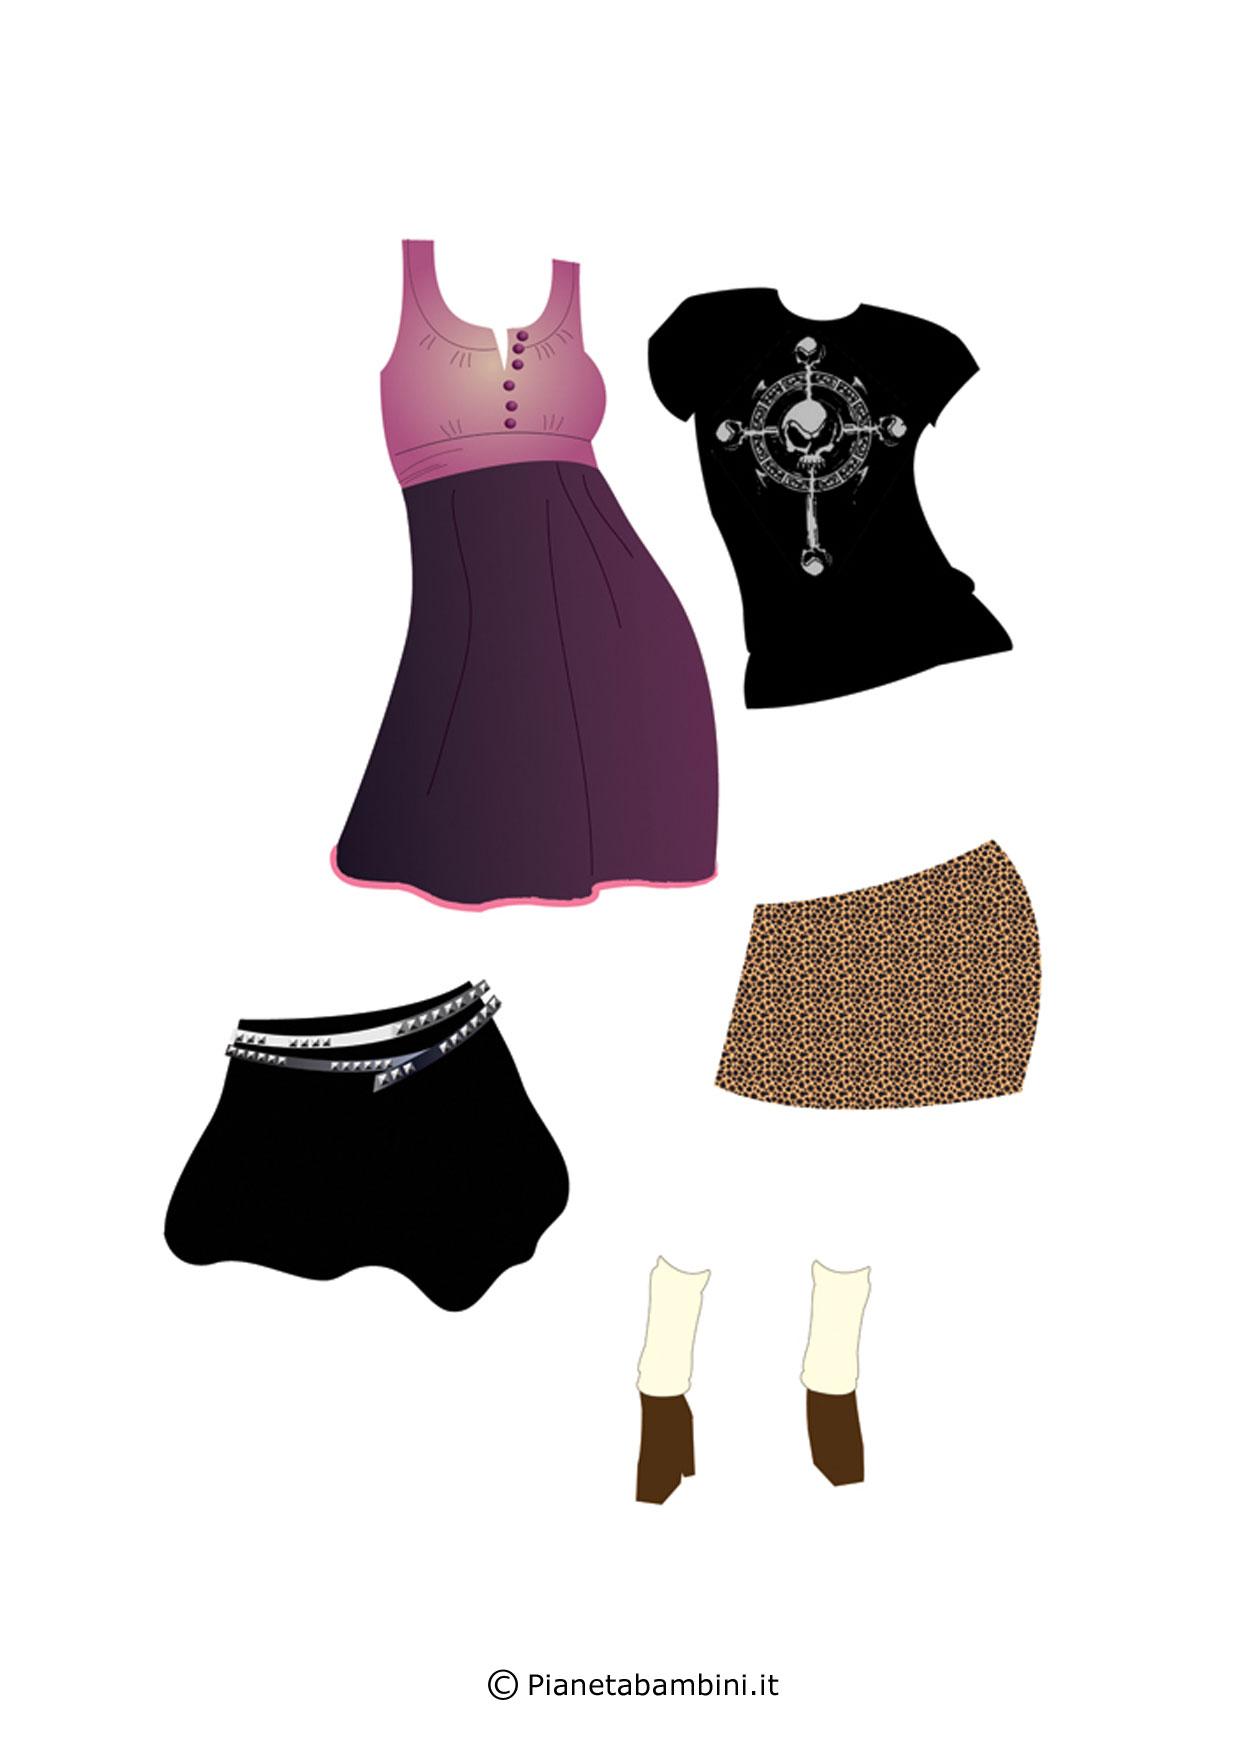 Modelle-Vestiti-Carta_6